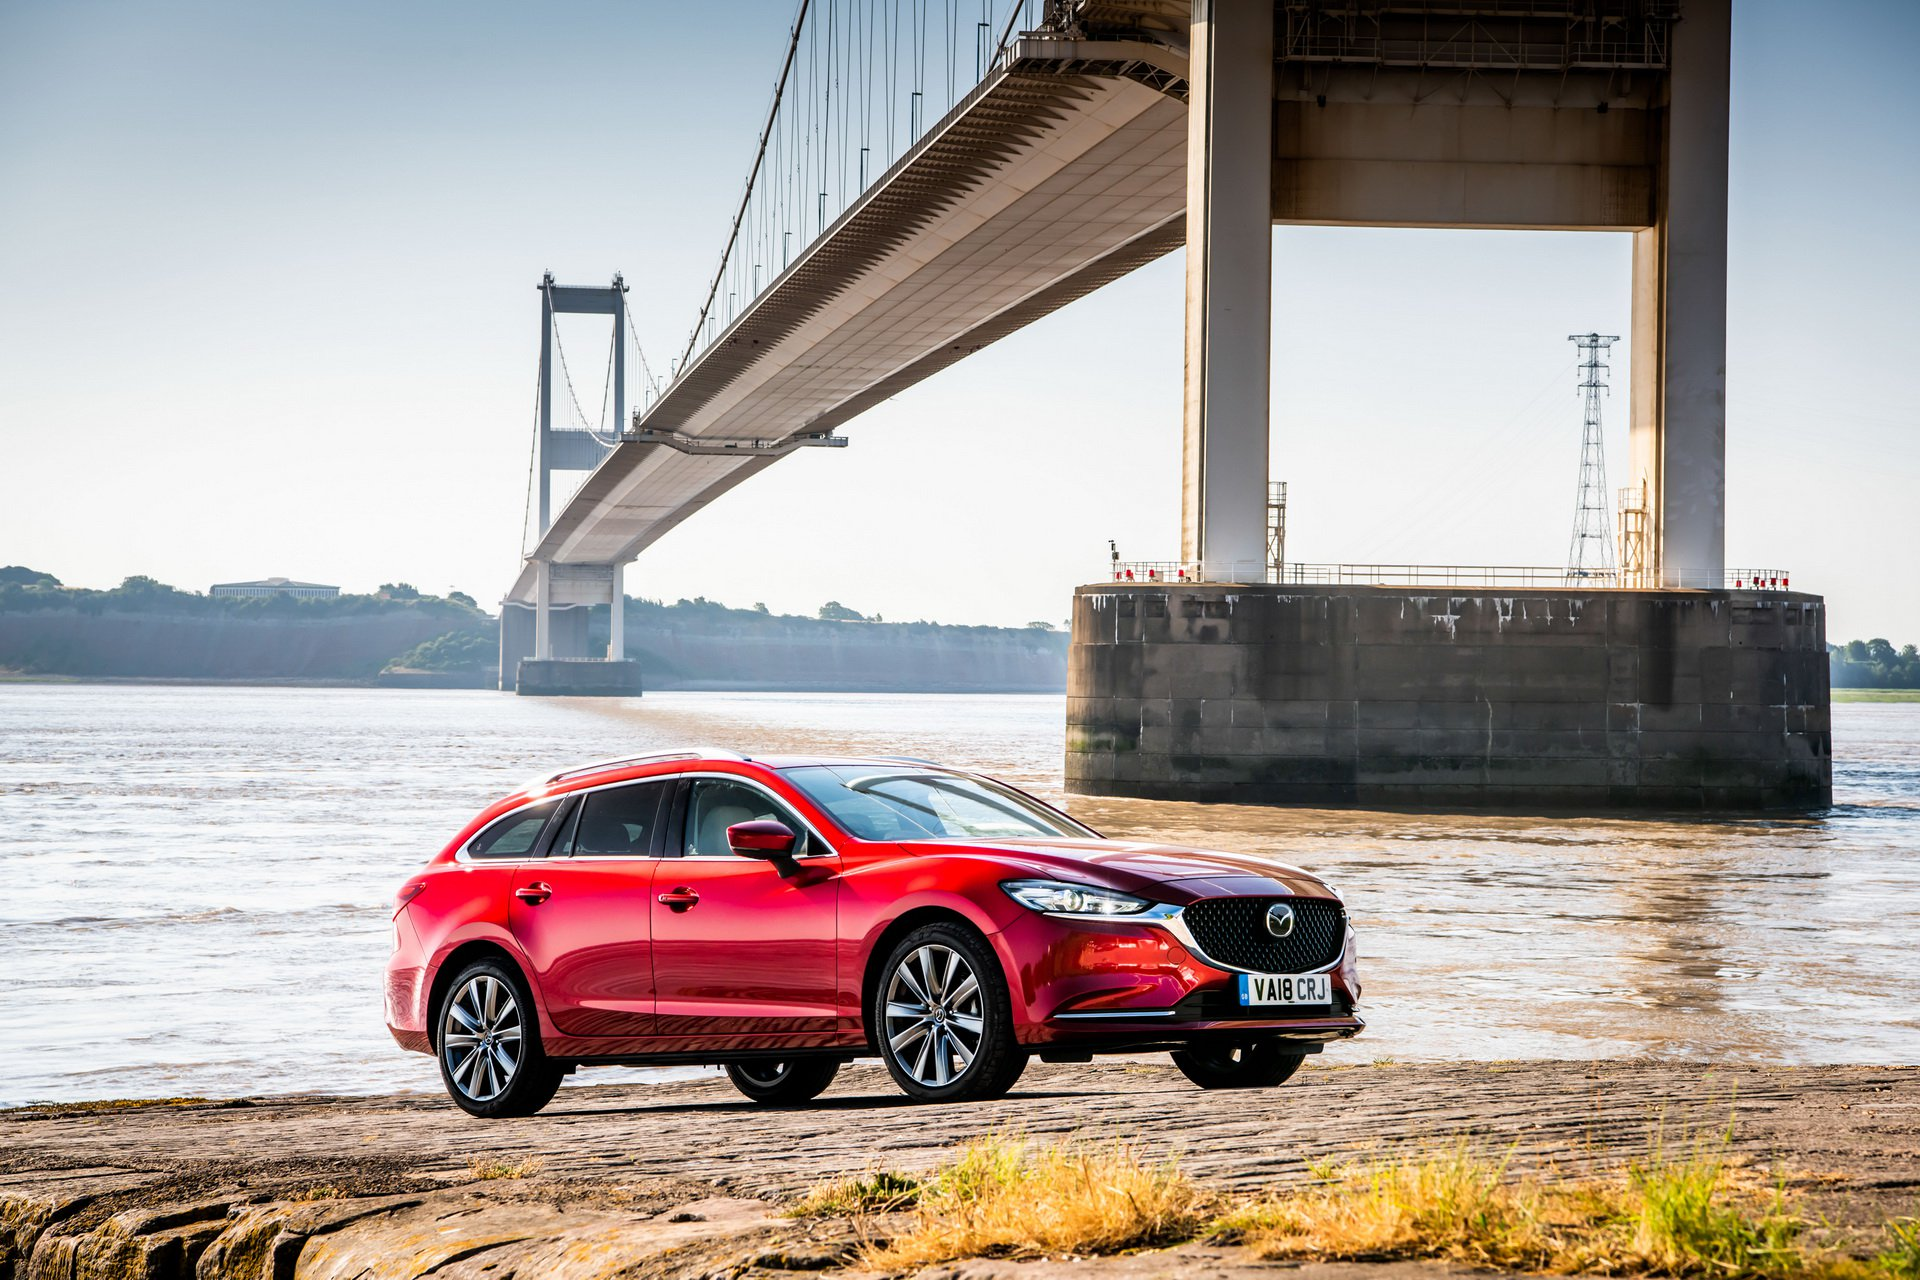 Mazda6-2018-ban-facelift-noi-that-yen-tinh-va-tiet-kiem-xang-hon-anh-4